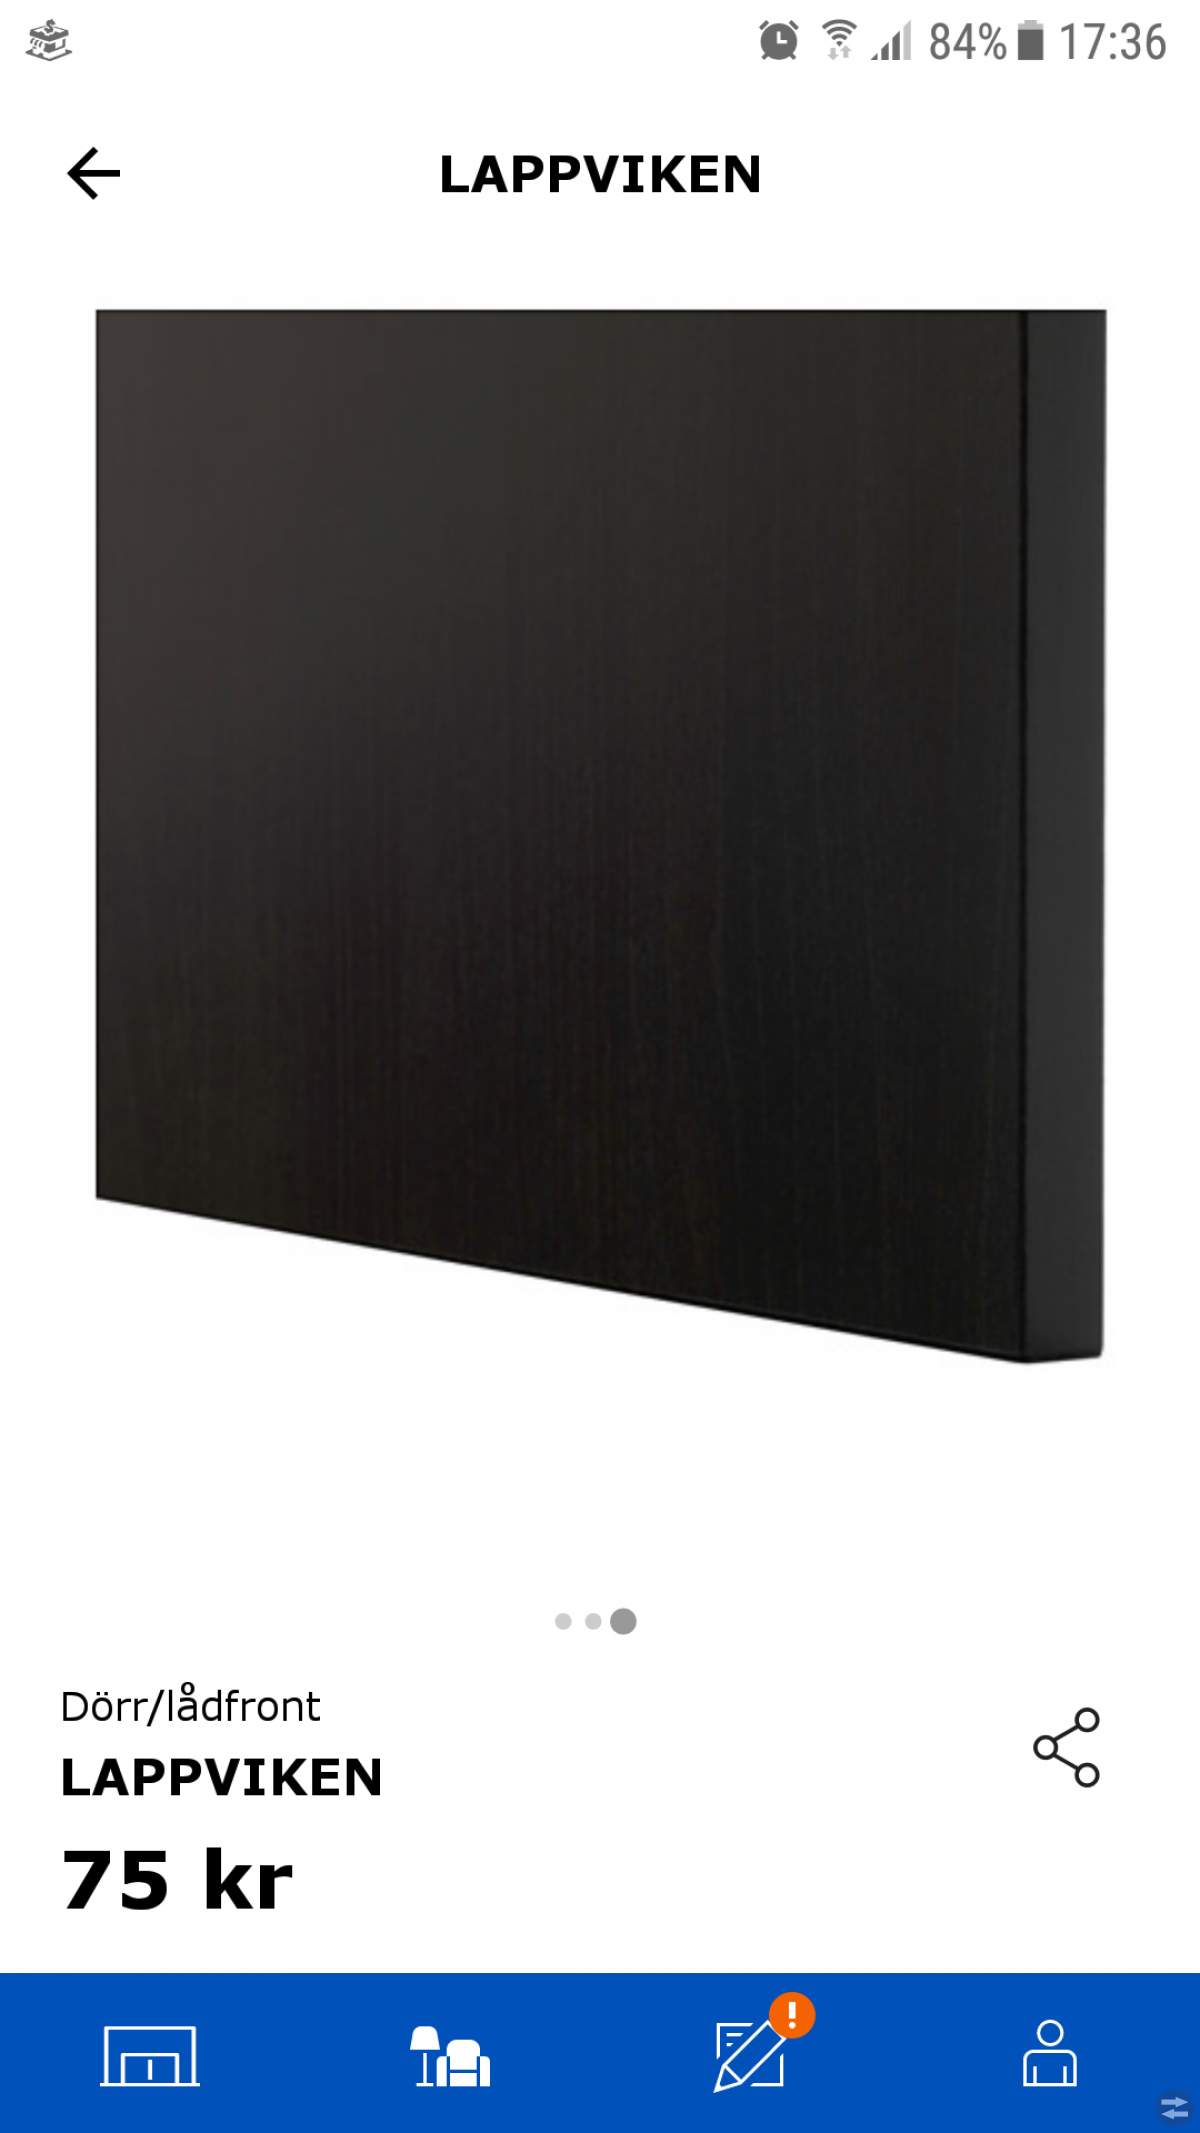 Dörr/lådfront LAPPVIKEN svartbrun